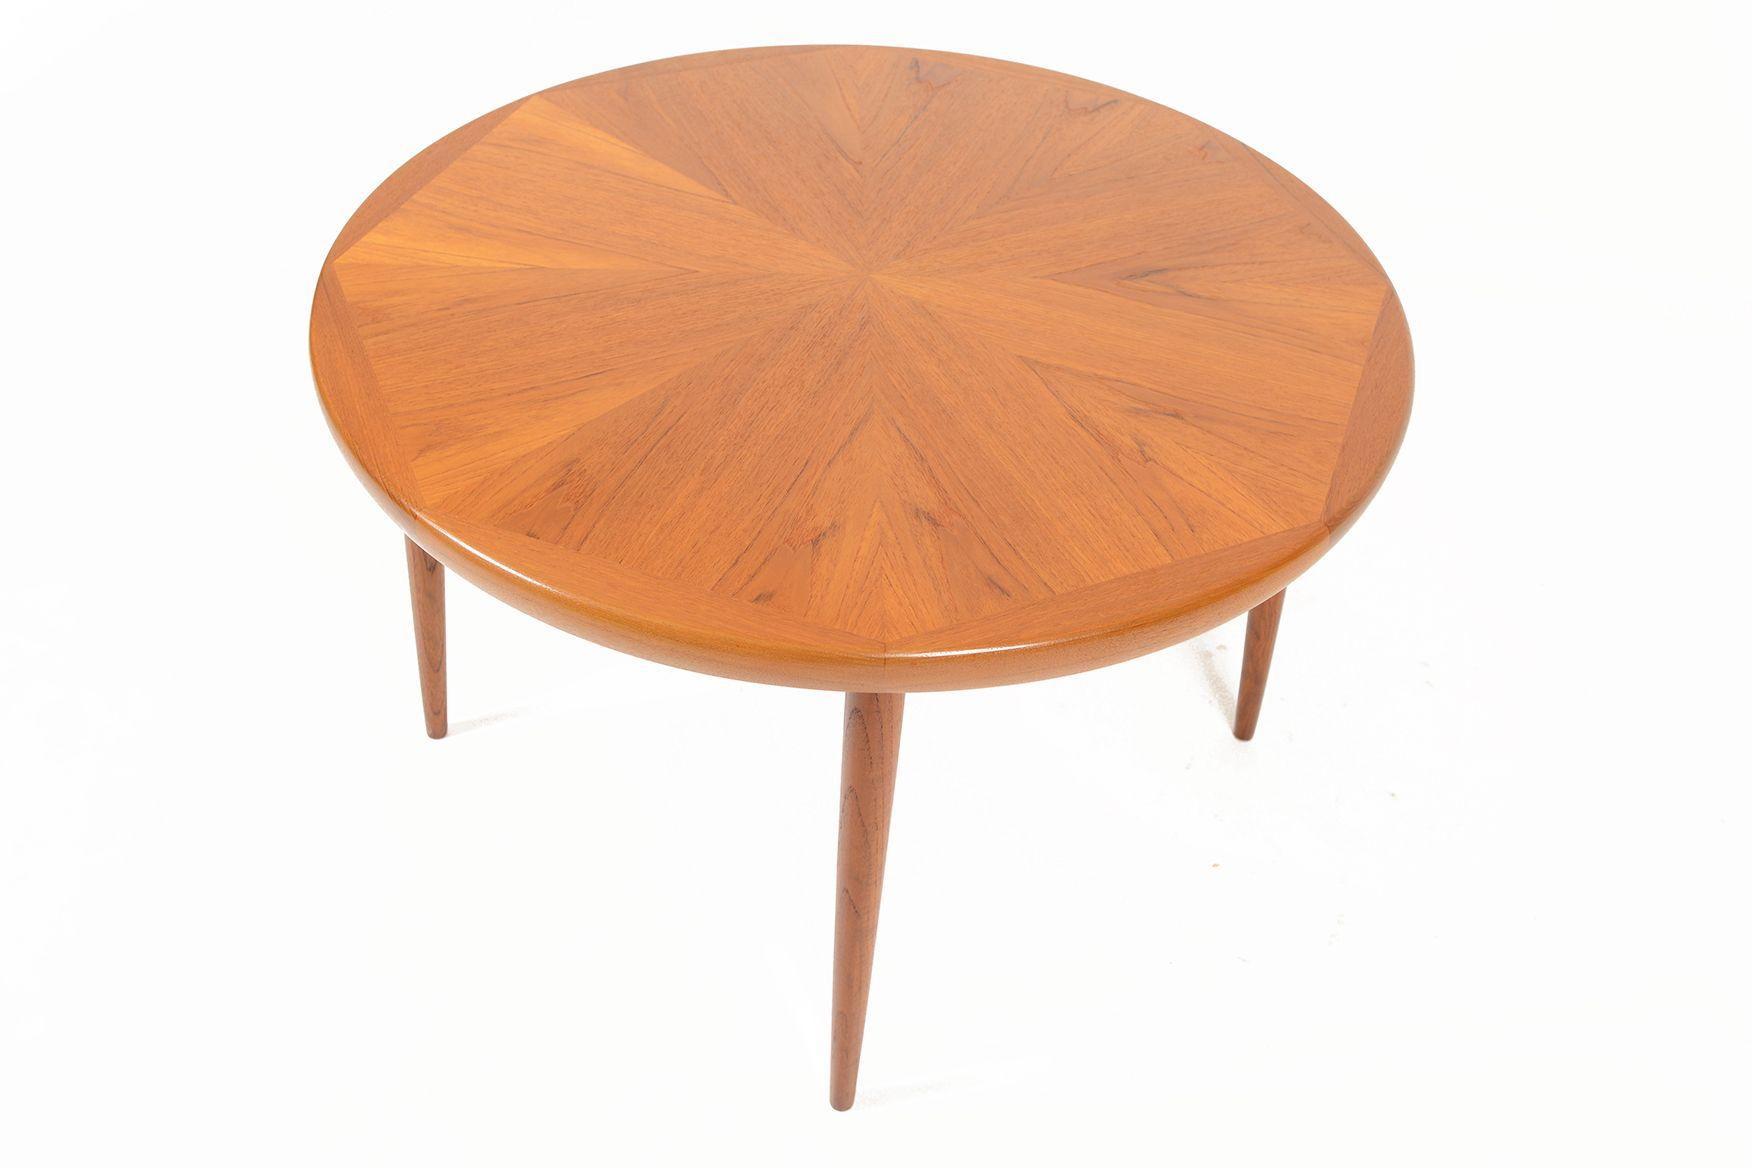 Danish Modern Round Starburst Teak Coffee Table Coffee Table Teak Coffee Table Mid Century Coffee Table [ 1168 x 1752 Pixel ]